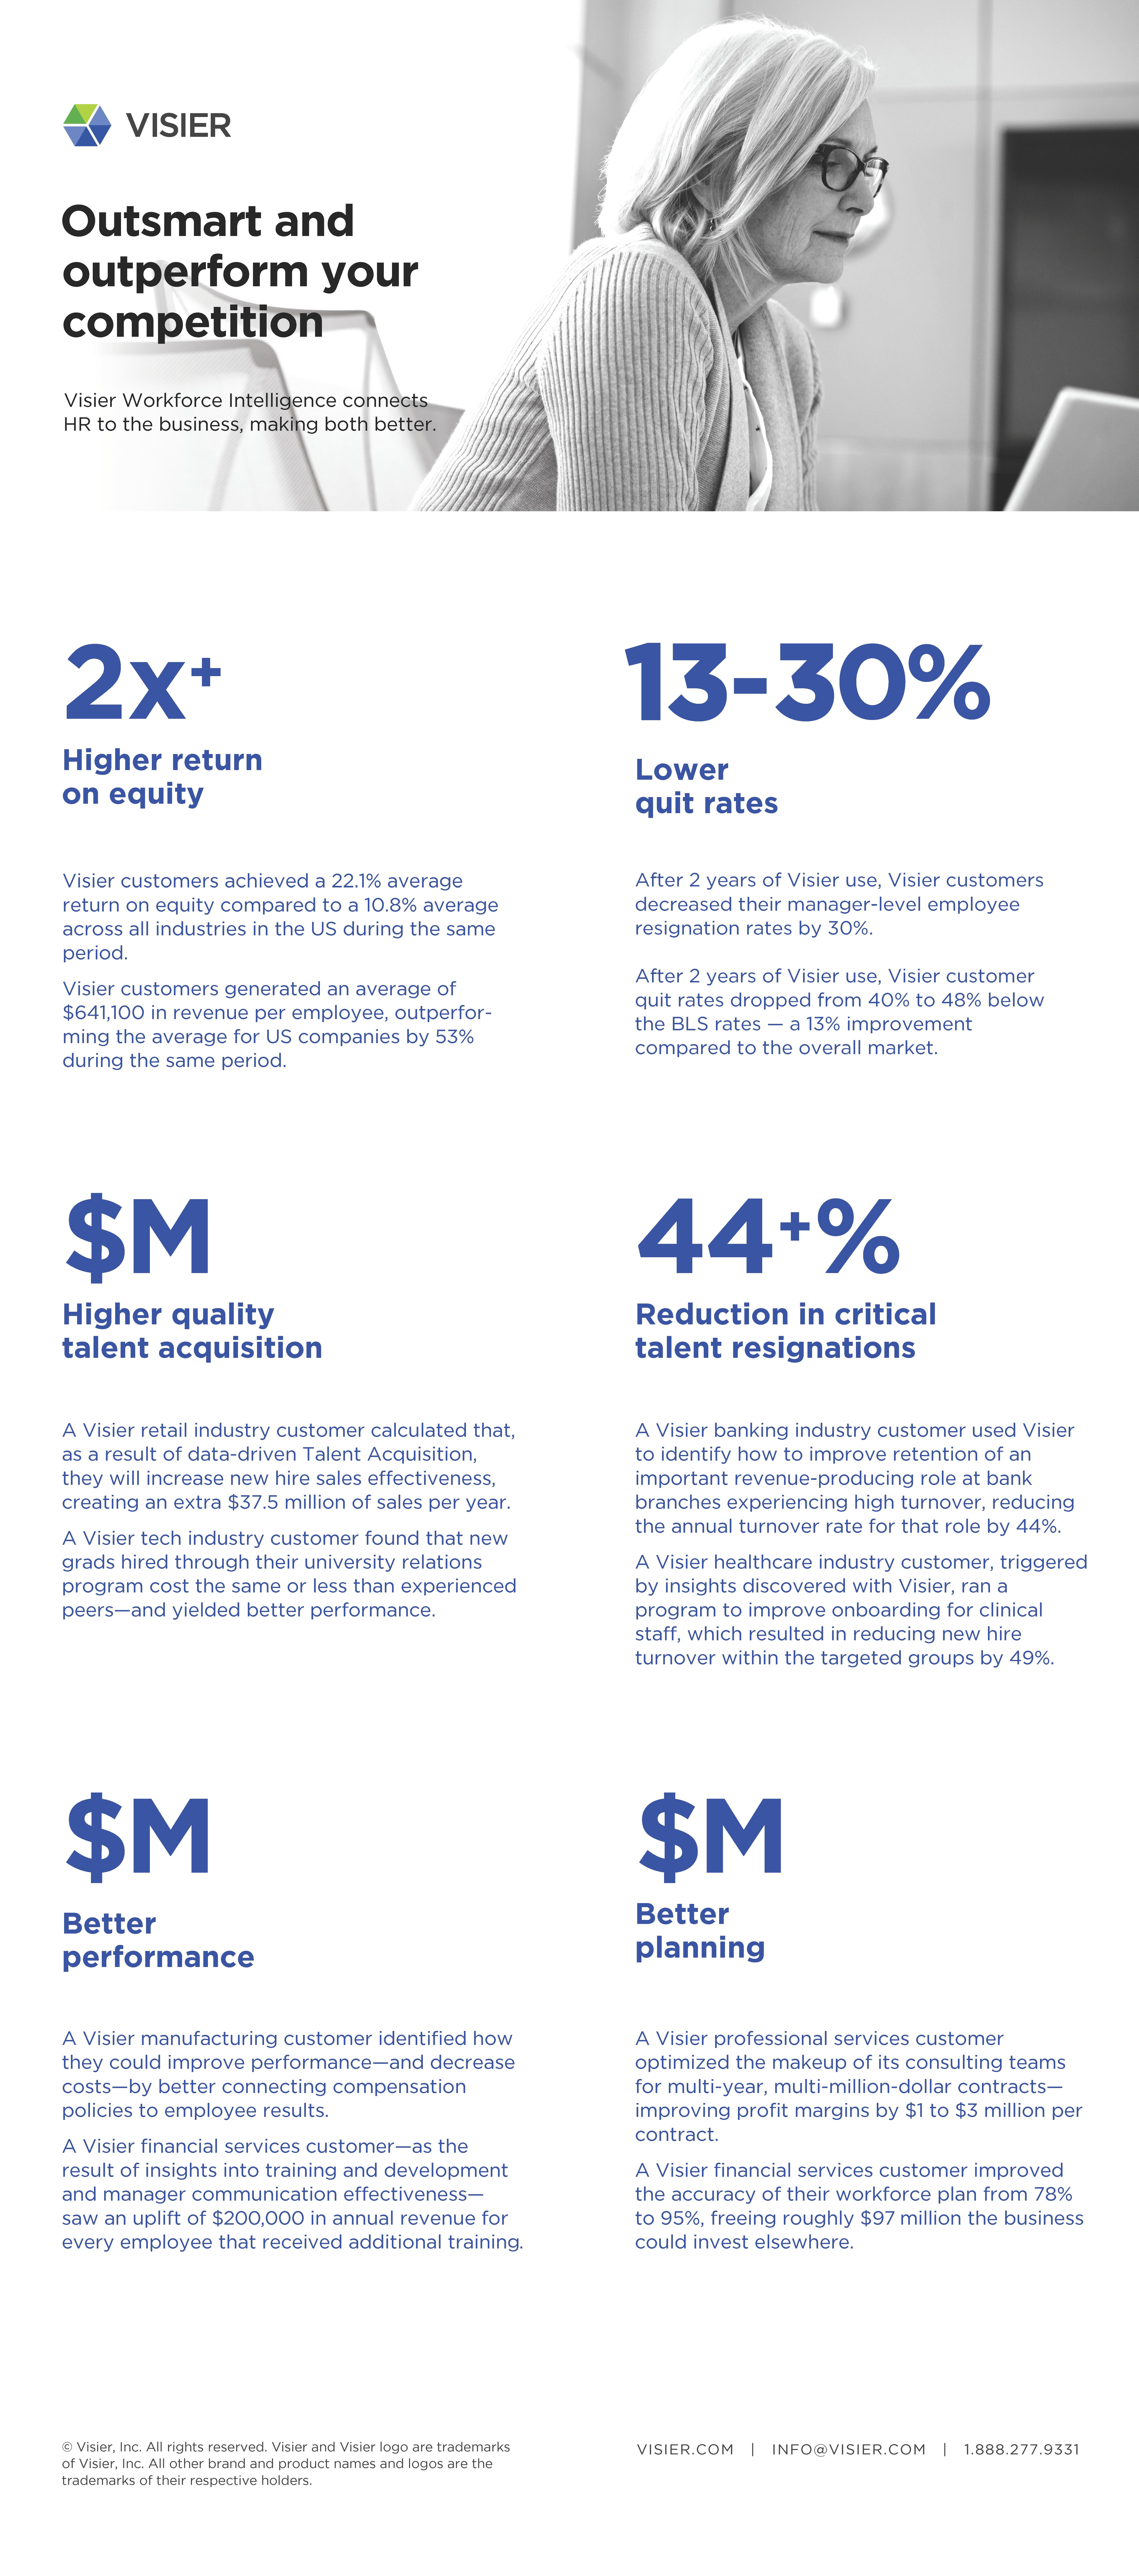 Visier Economic Impact Key Findings